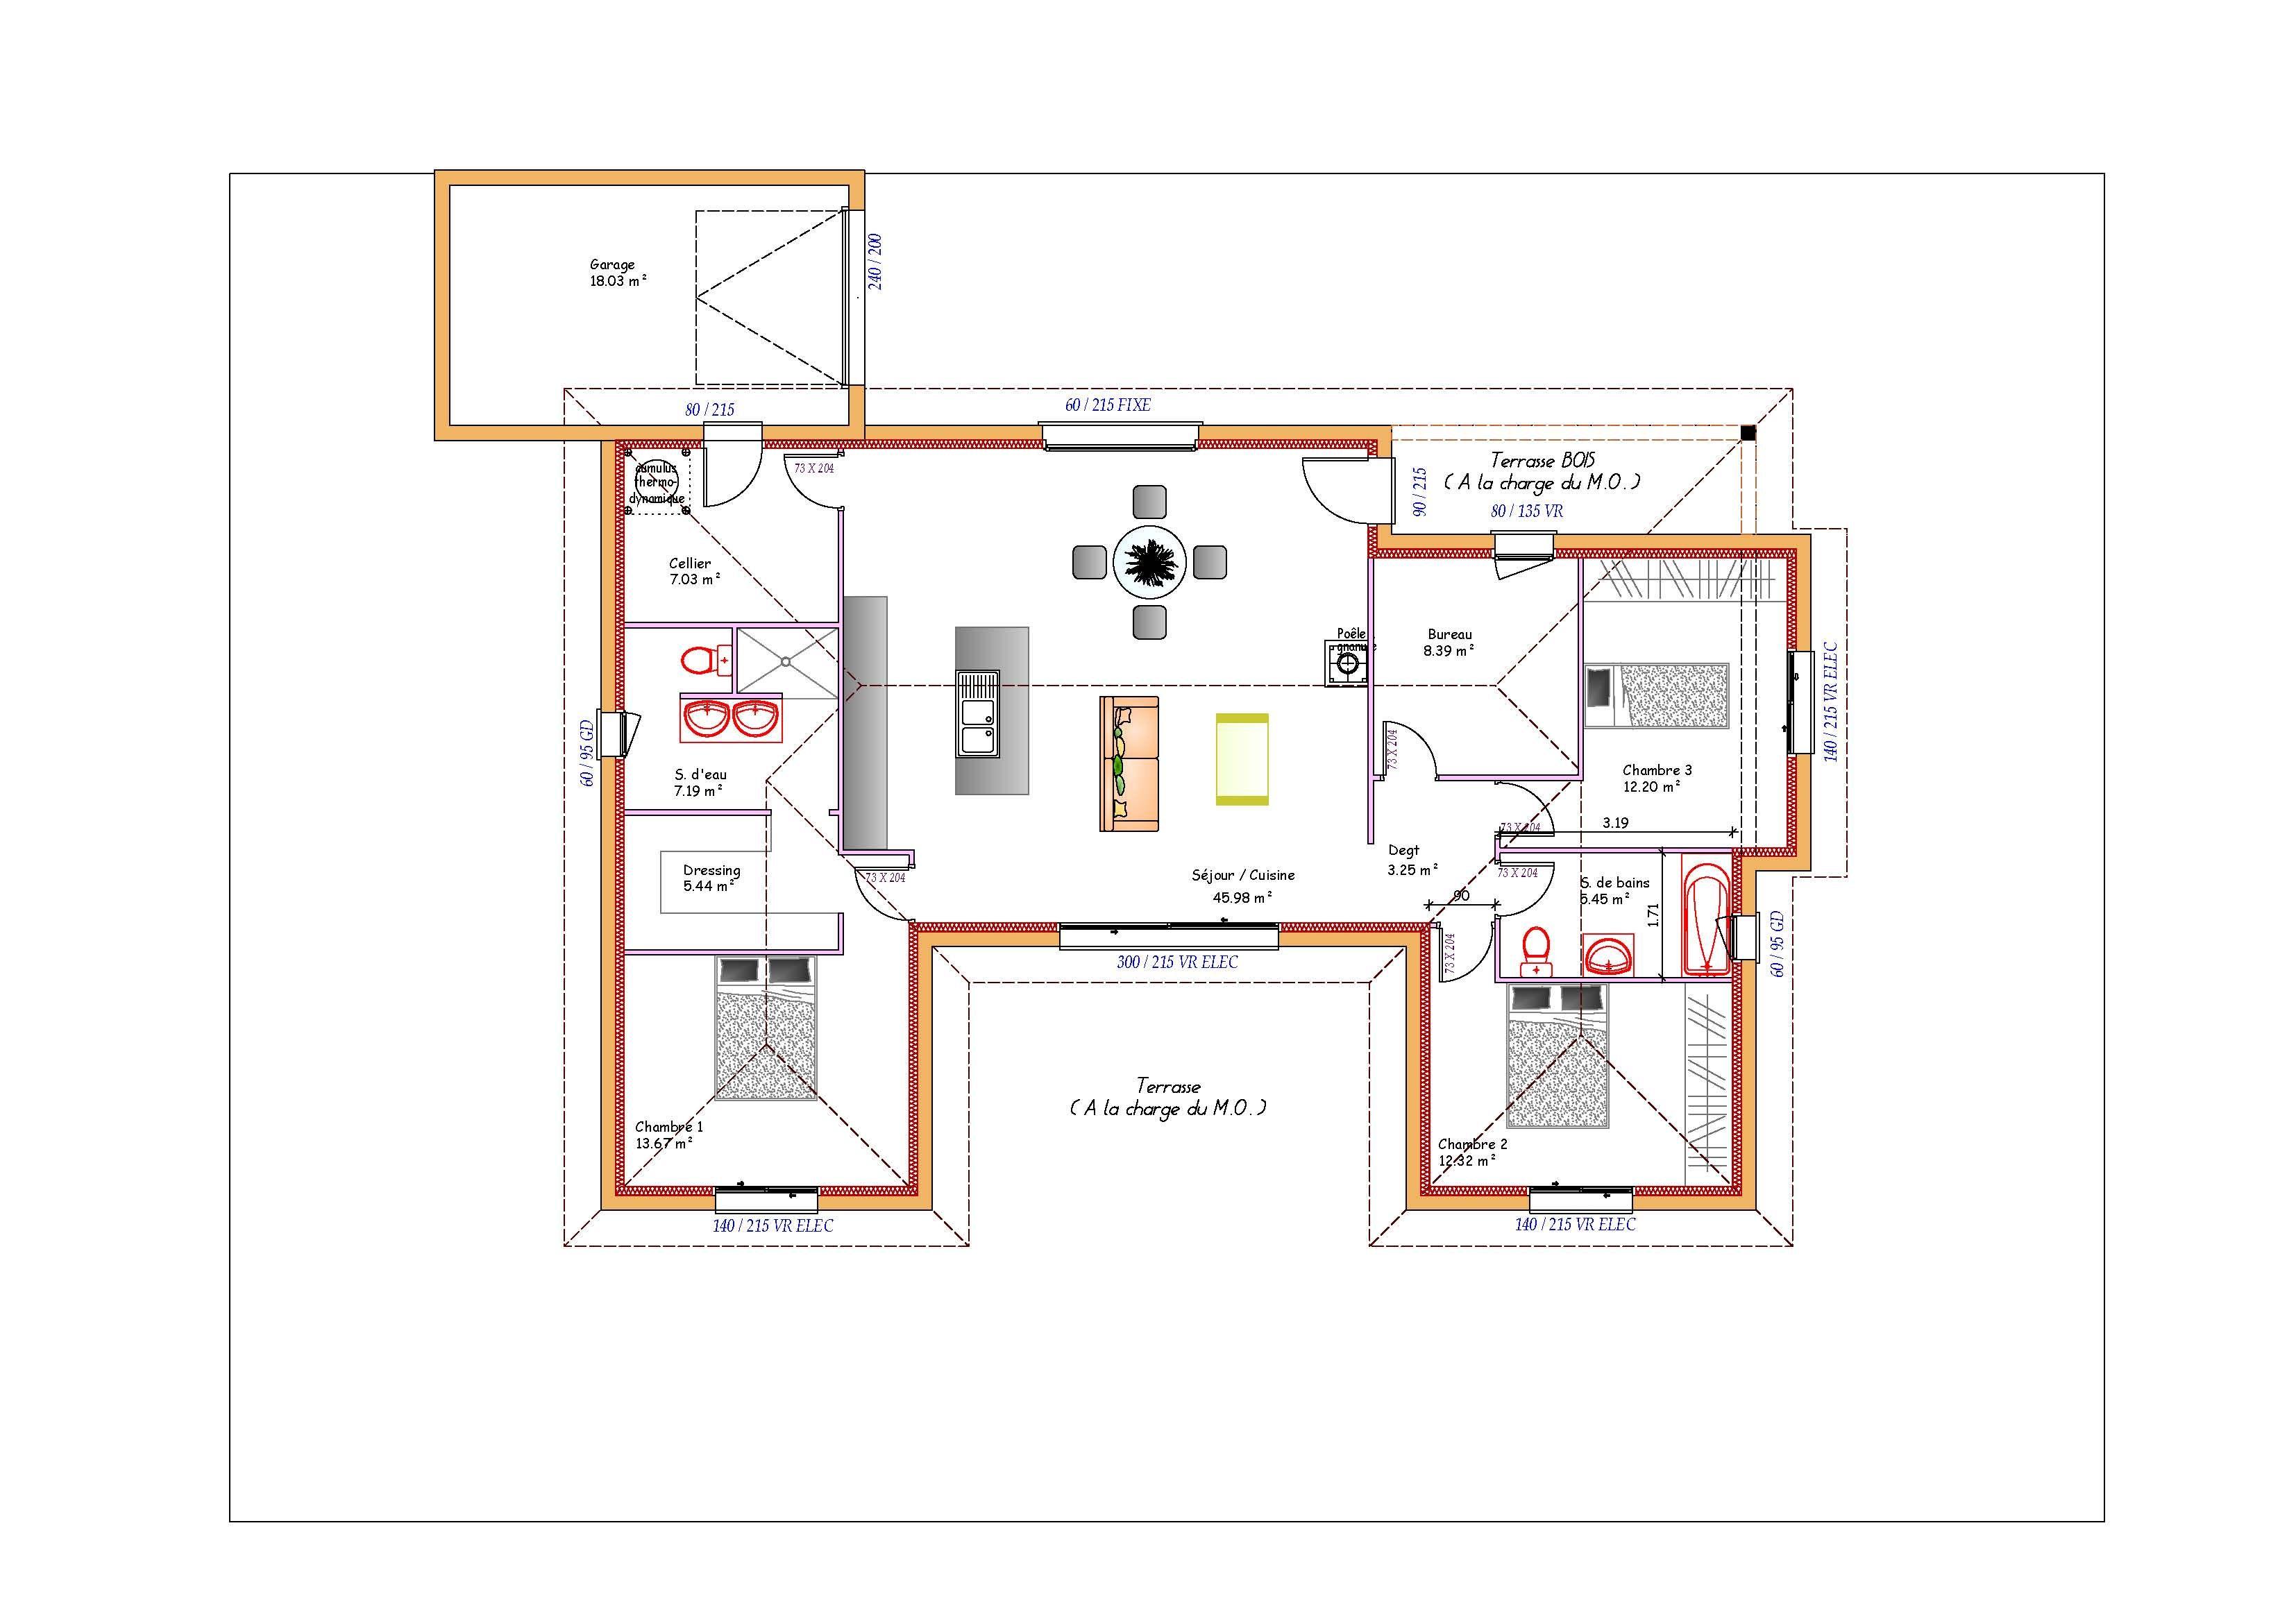 Pin By Herve Gonzalve On Plans De Maison In 2019 Plan Maison En U